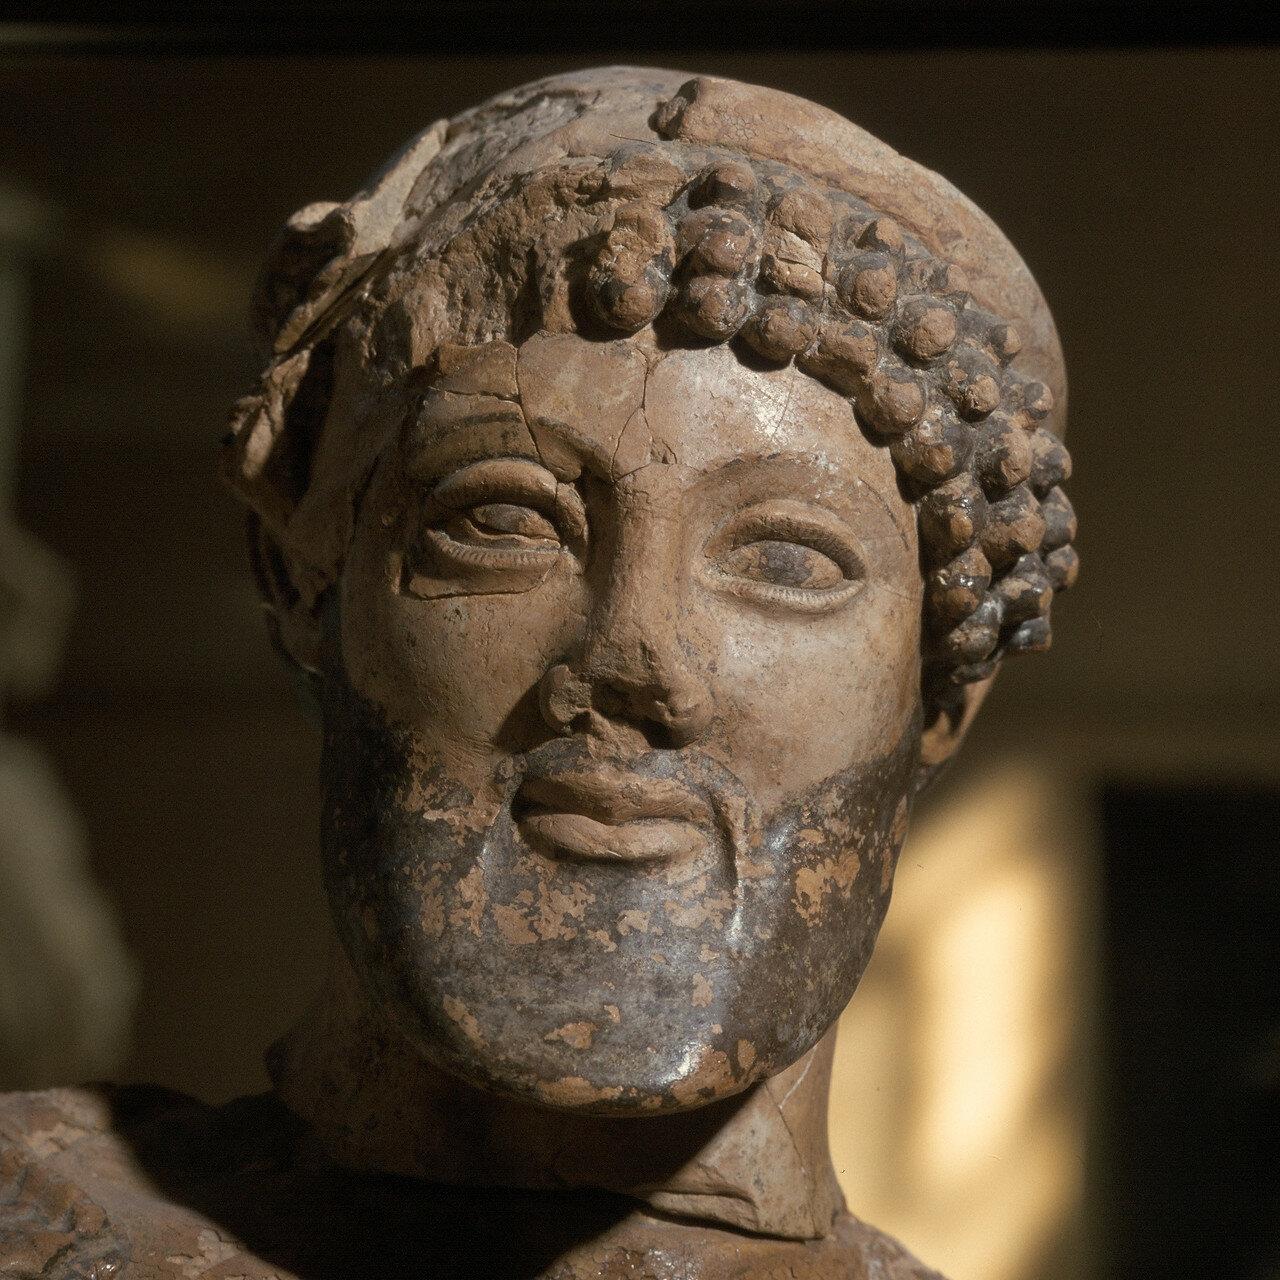 Олимпия. Музей. Голова Зевса из терракота. 480-470 до н.э.